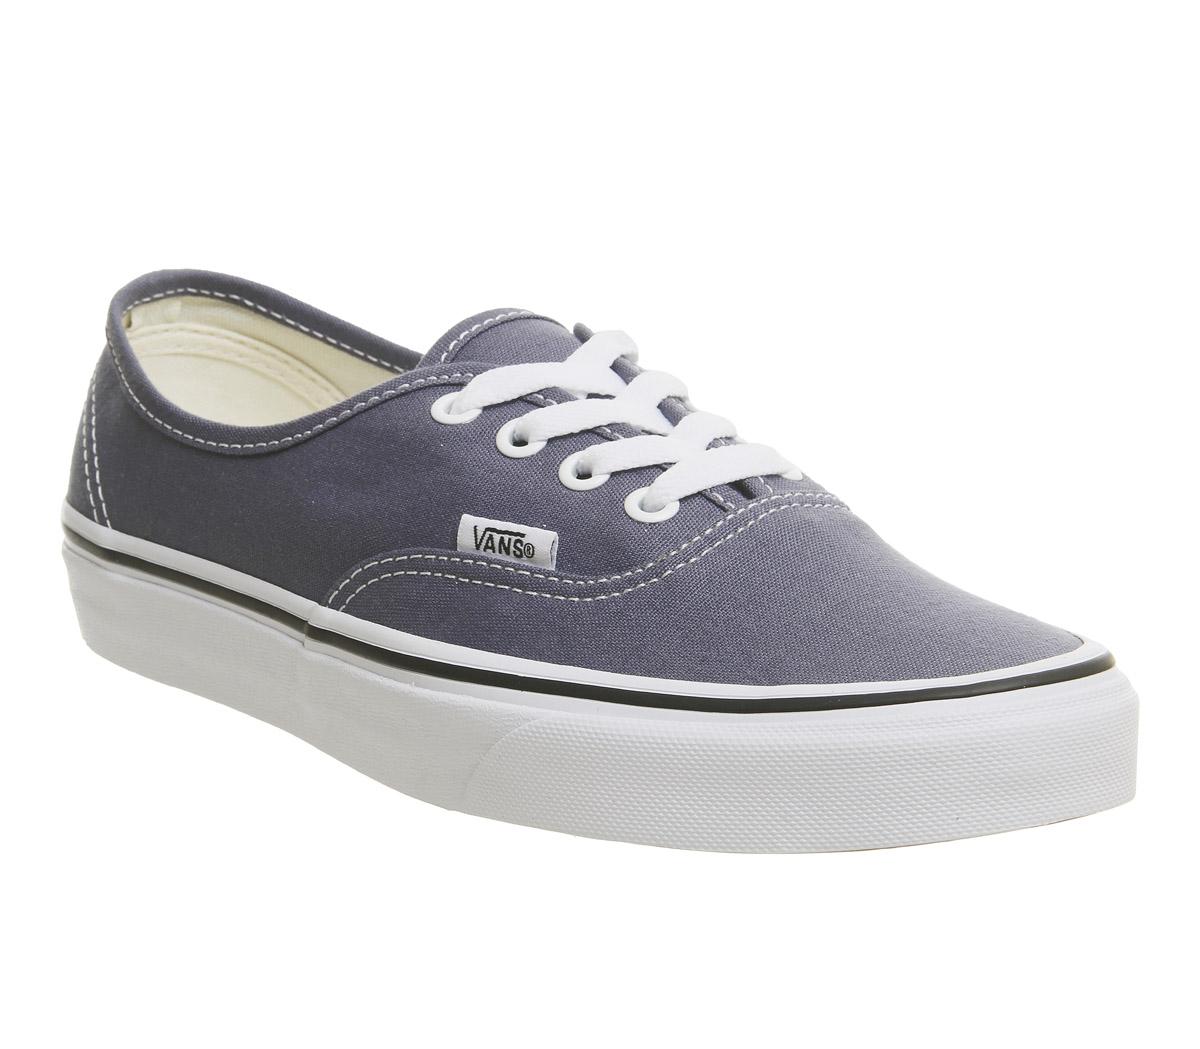 SENTINEL Mens Vans Shoes vero bianco formatori di formatori autentico  GRISAILLE 828d4aa1cac